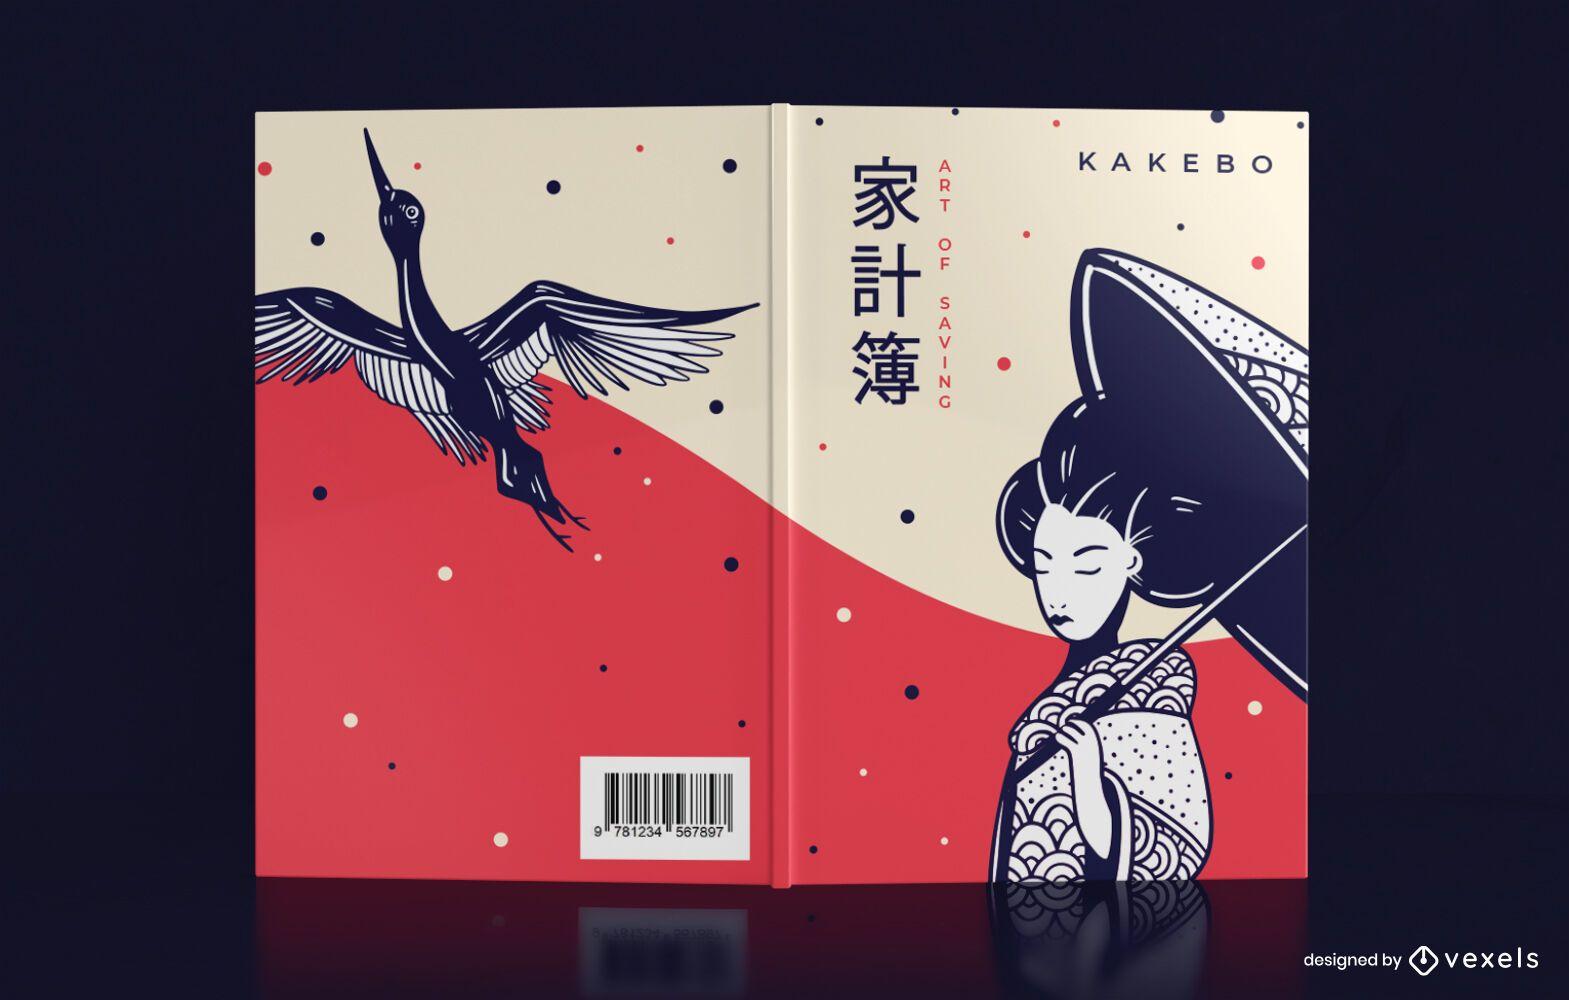 Kakebo Saving Journal Cover Design